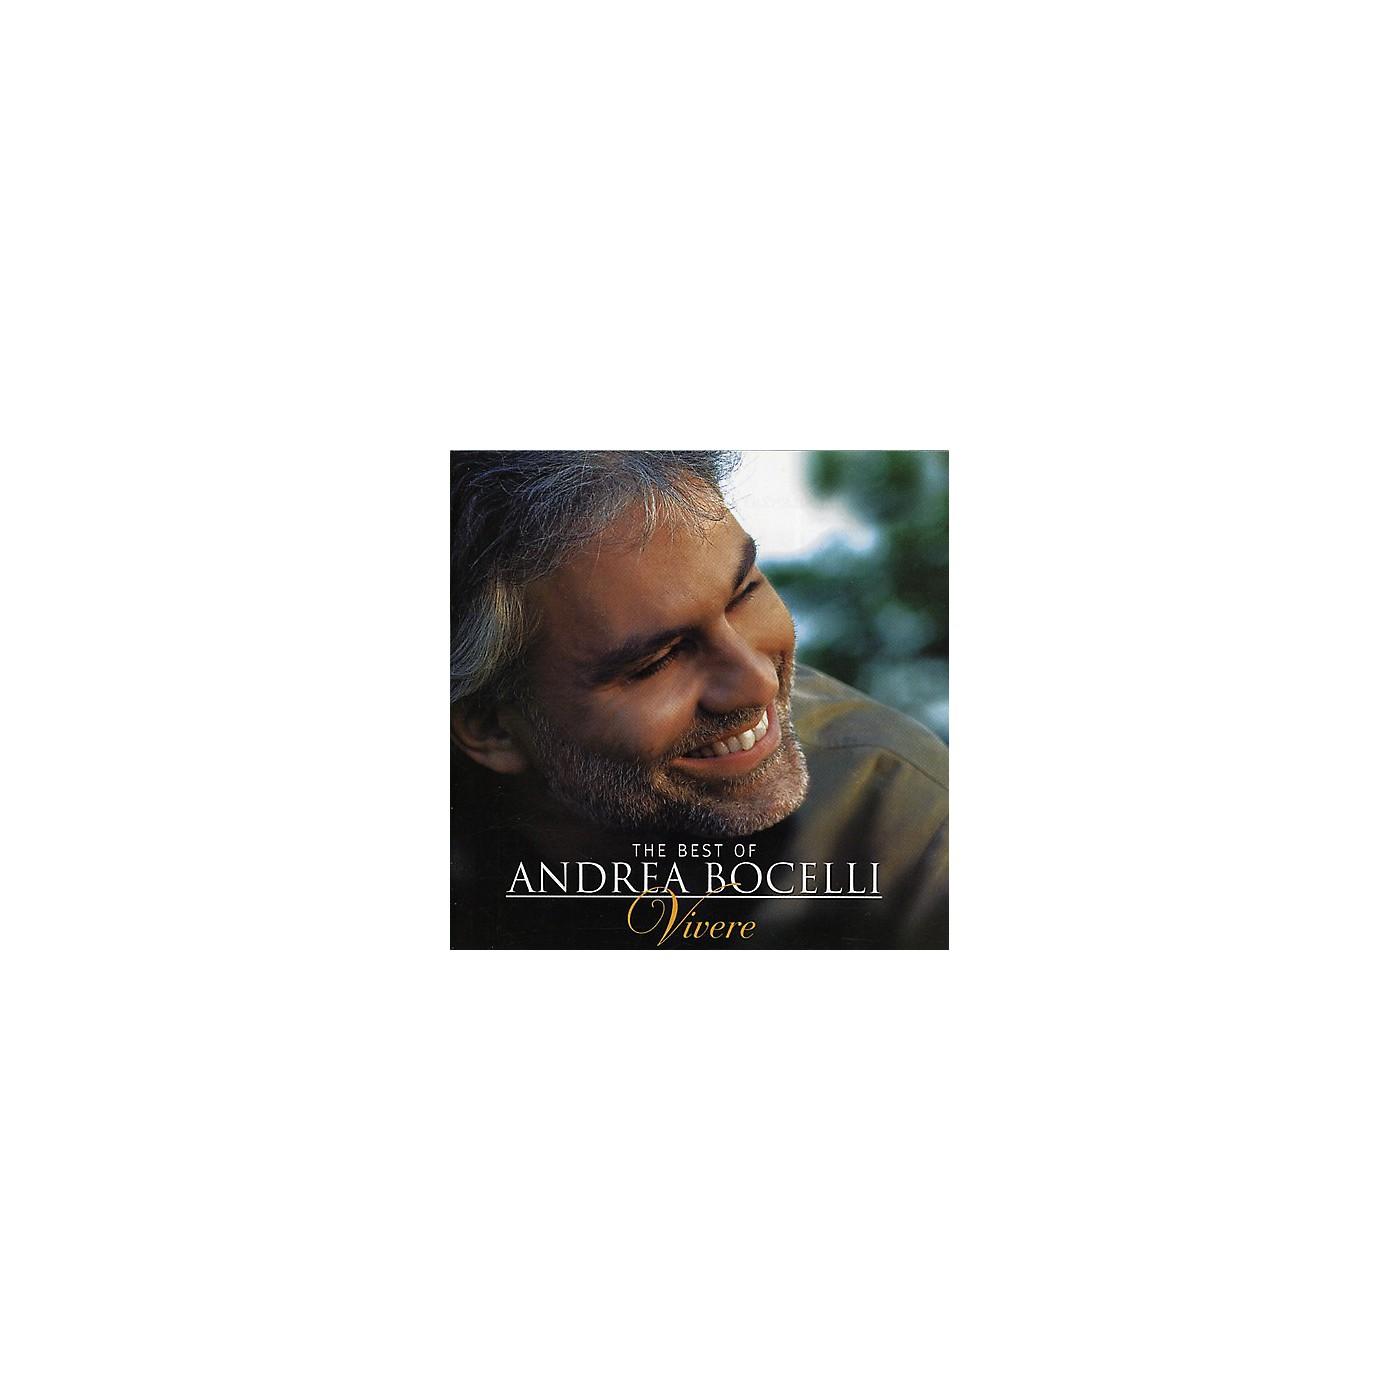 Alliance Andrea Bocelli - Best of Andrea Bocelli: Vivere (CD) thumbnail